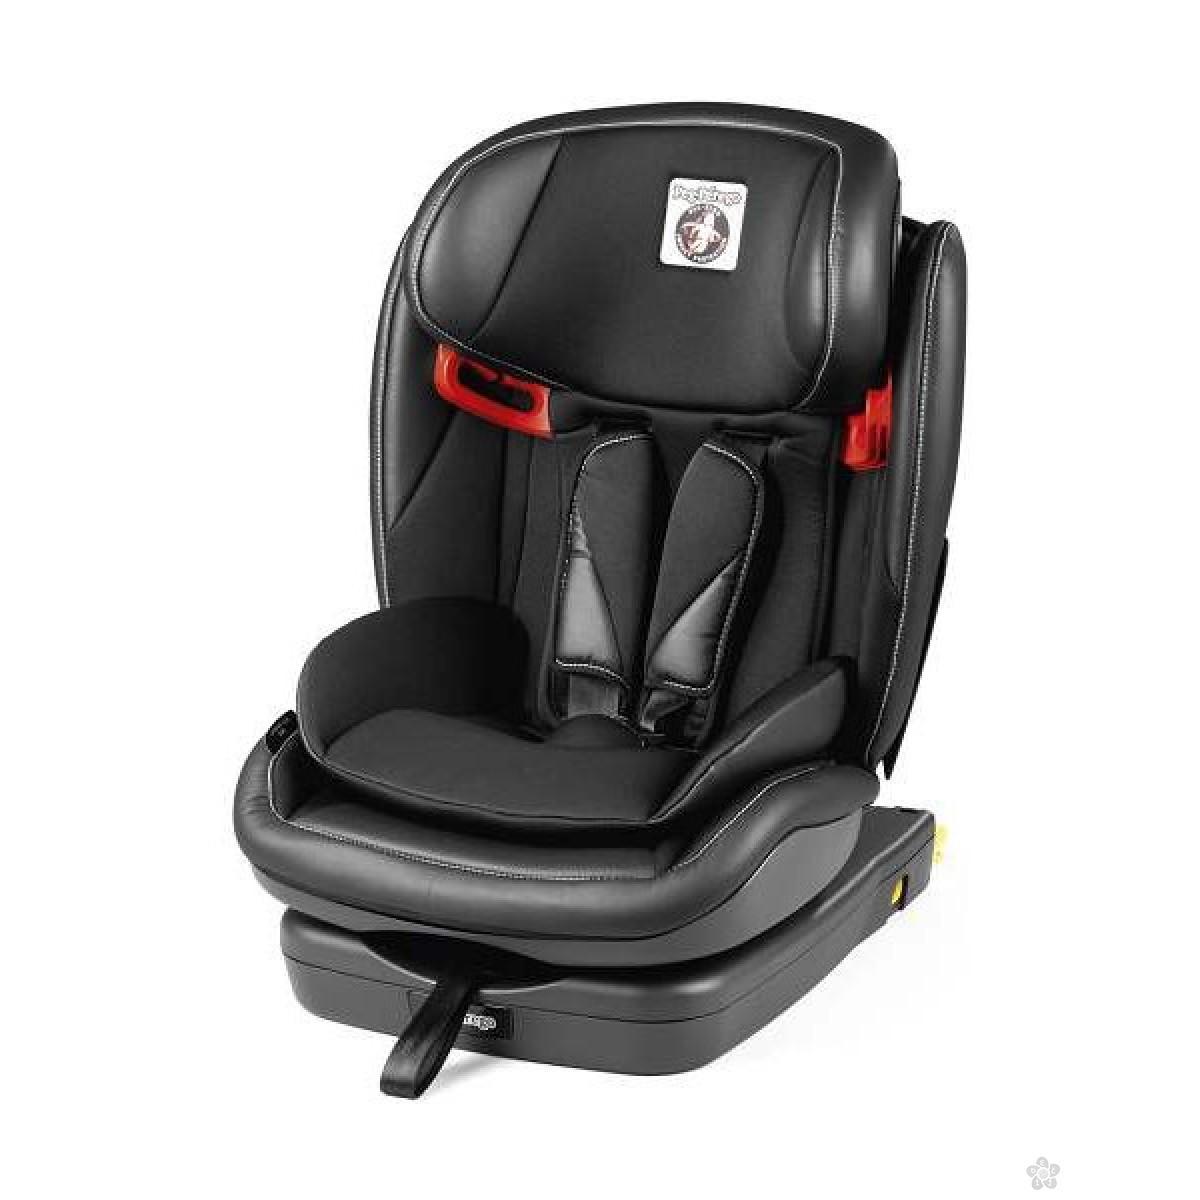 Auto Sedište Viaggio 1-2-3 VIA Licorice